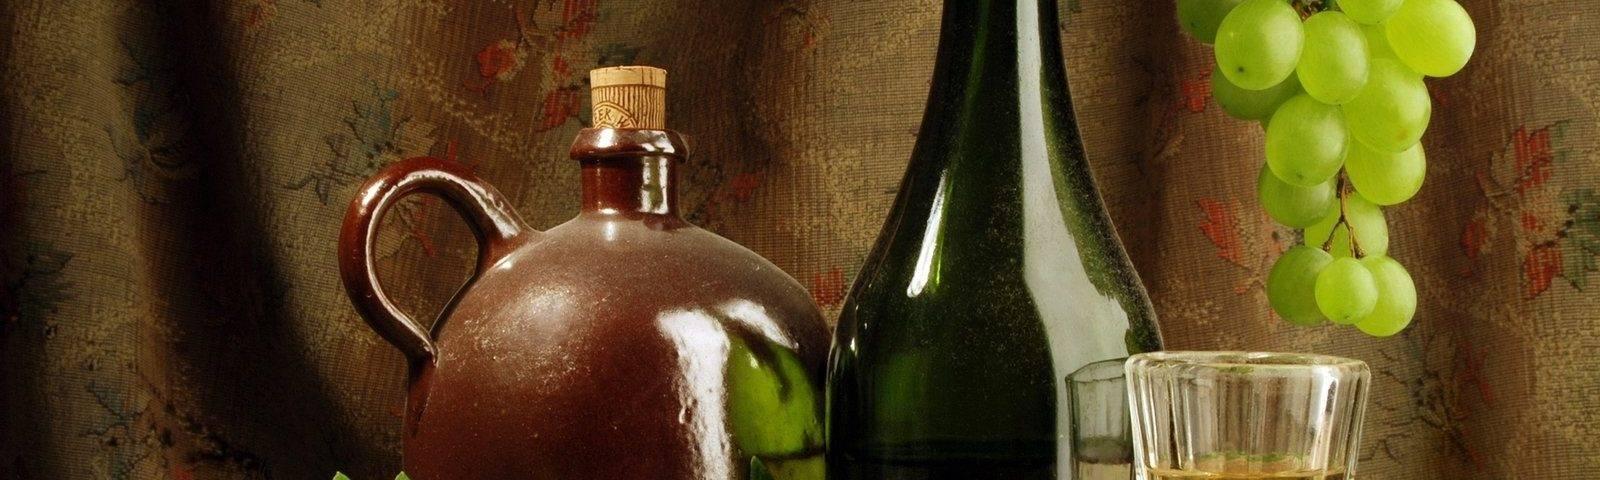 Домашний самогон из винограда